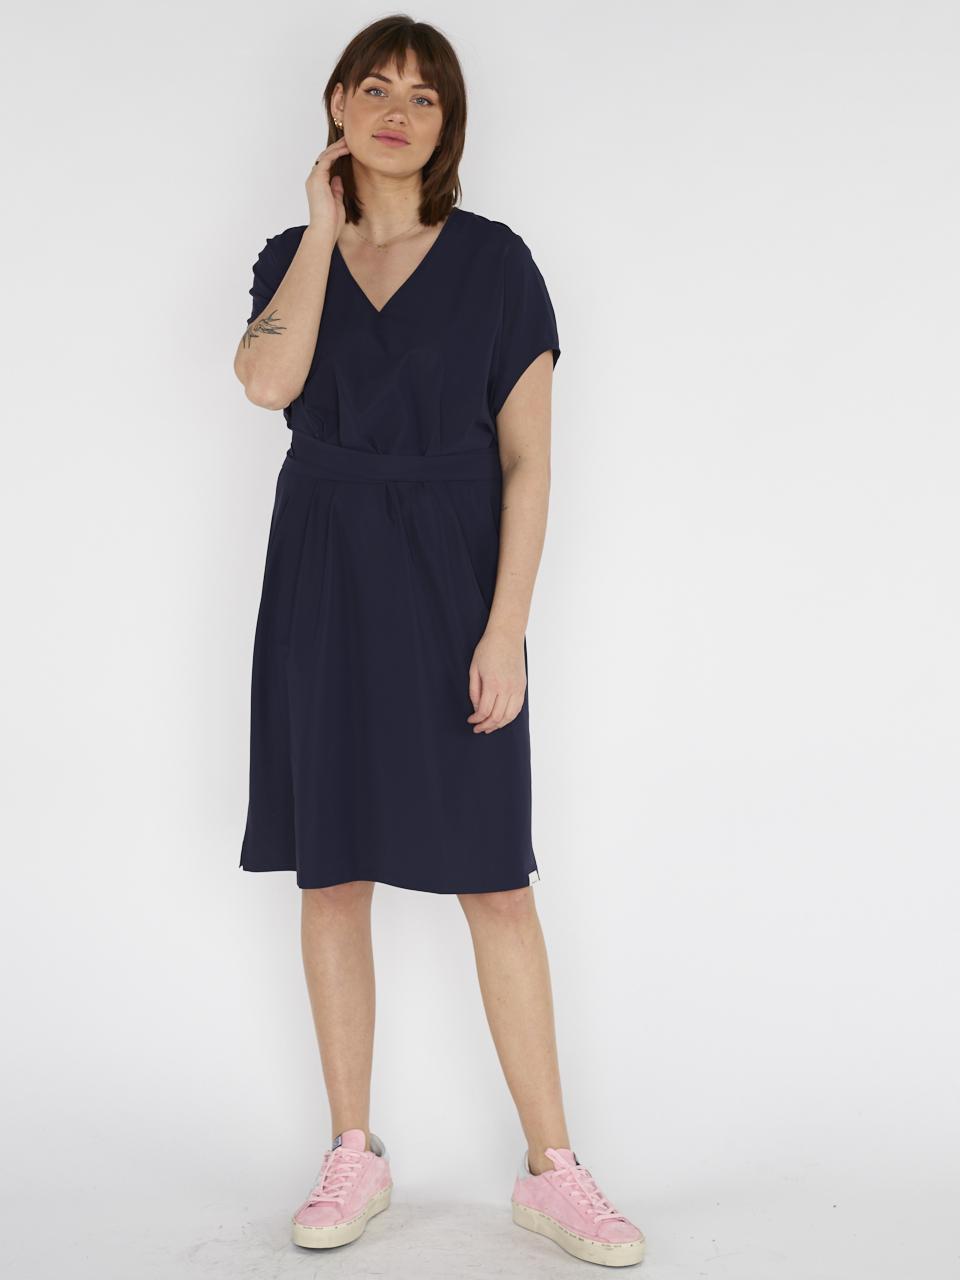 DRESS N434